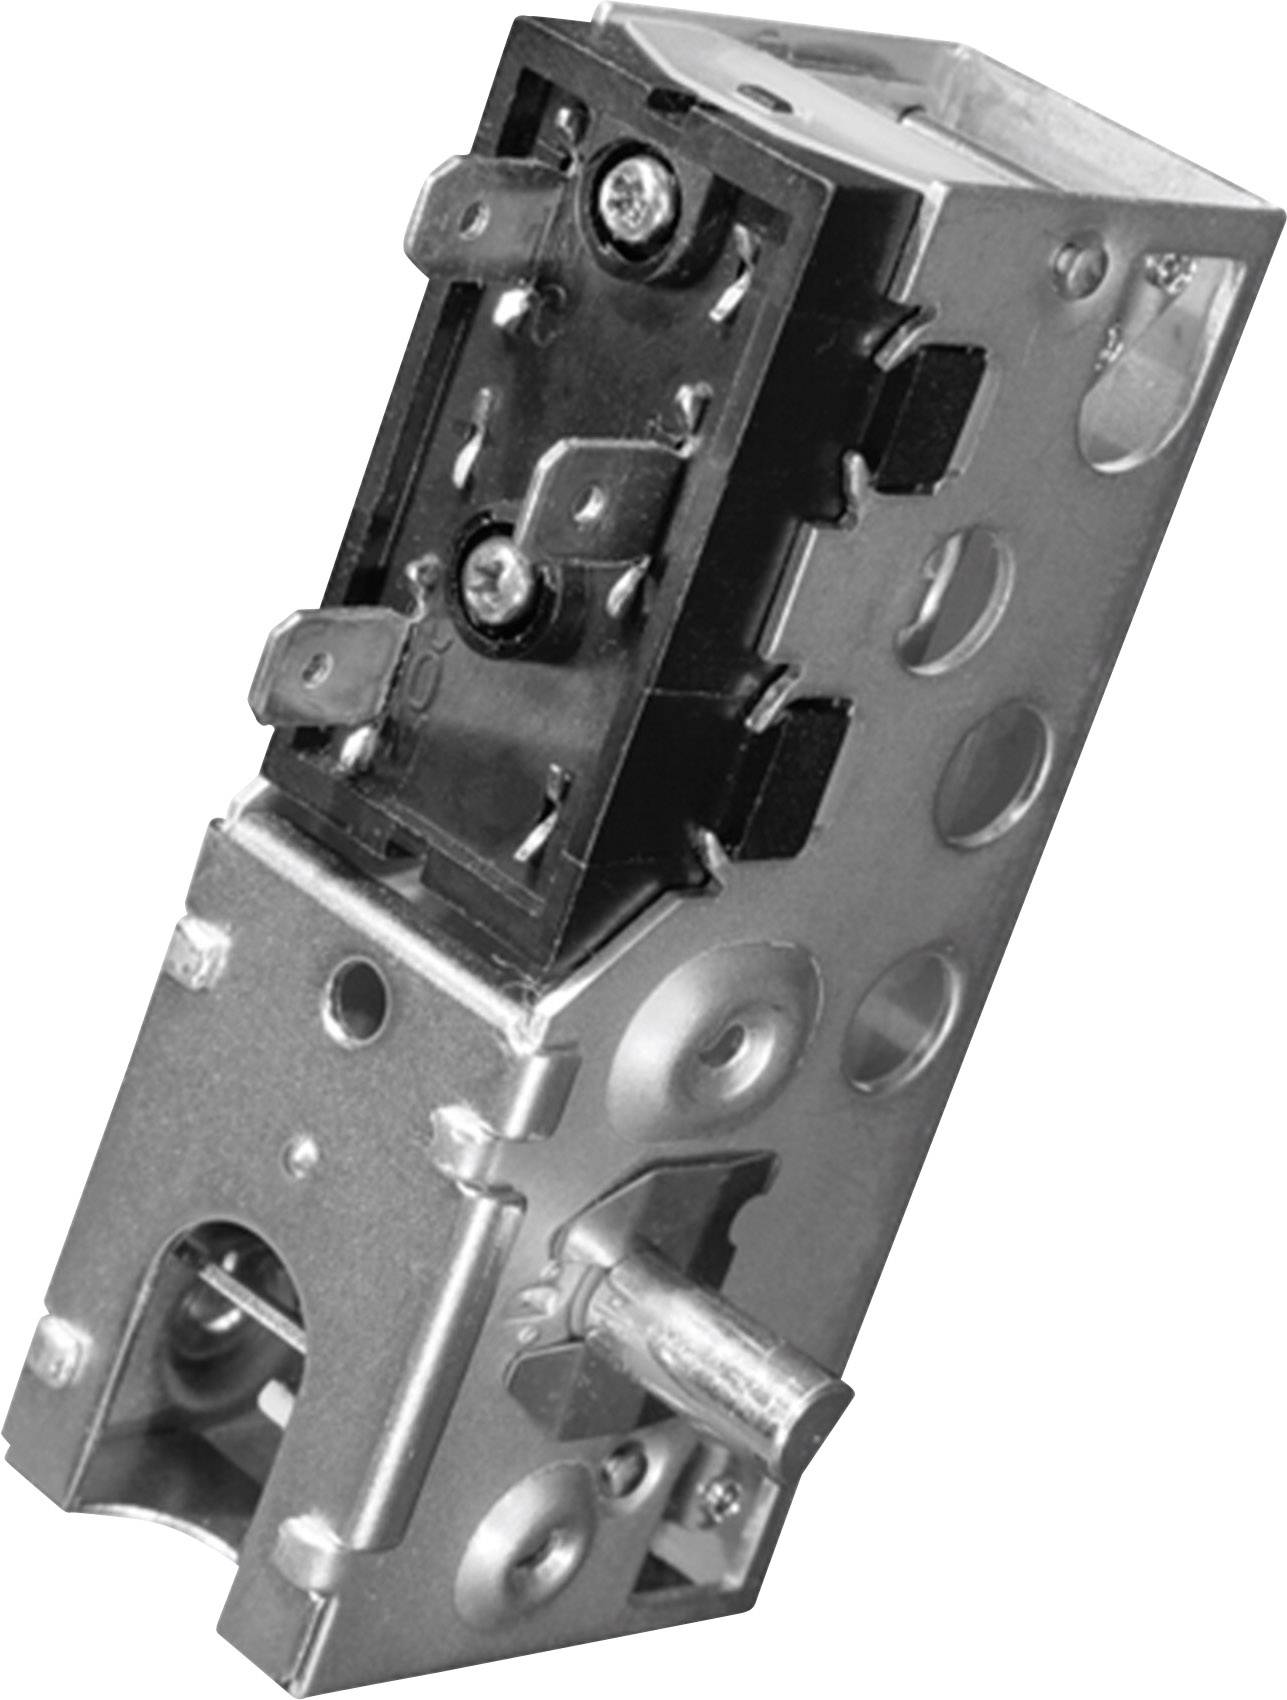 B+B Thermo-Technik FEUCHTESCHALTER TW2001A, 10 - 80 % r., 10 - 40 °C